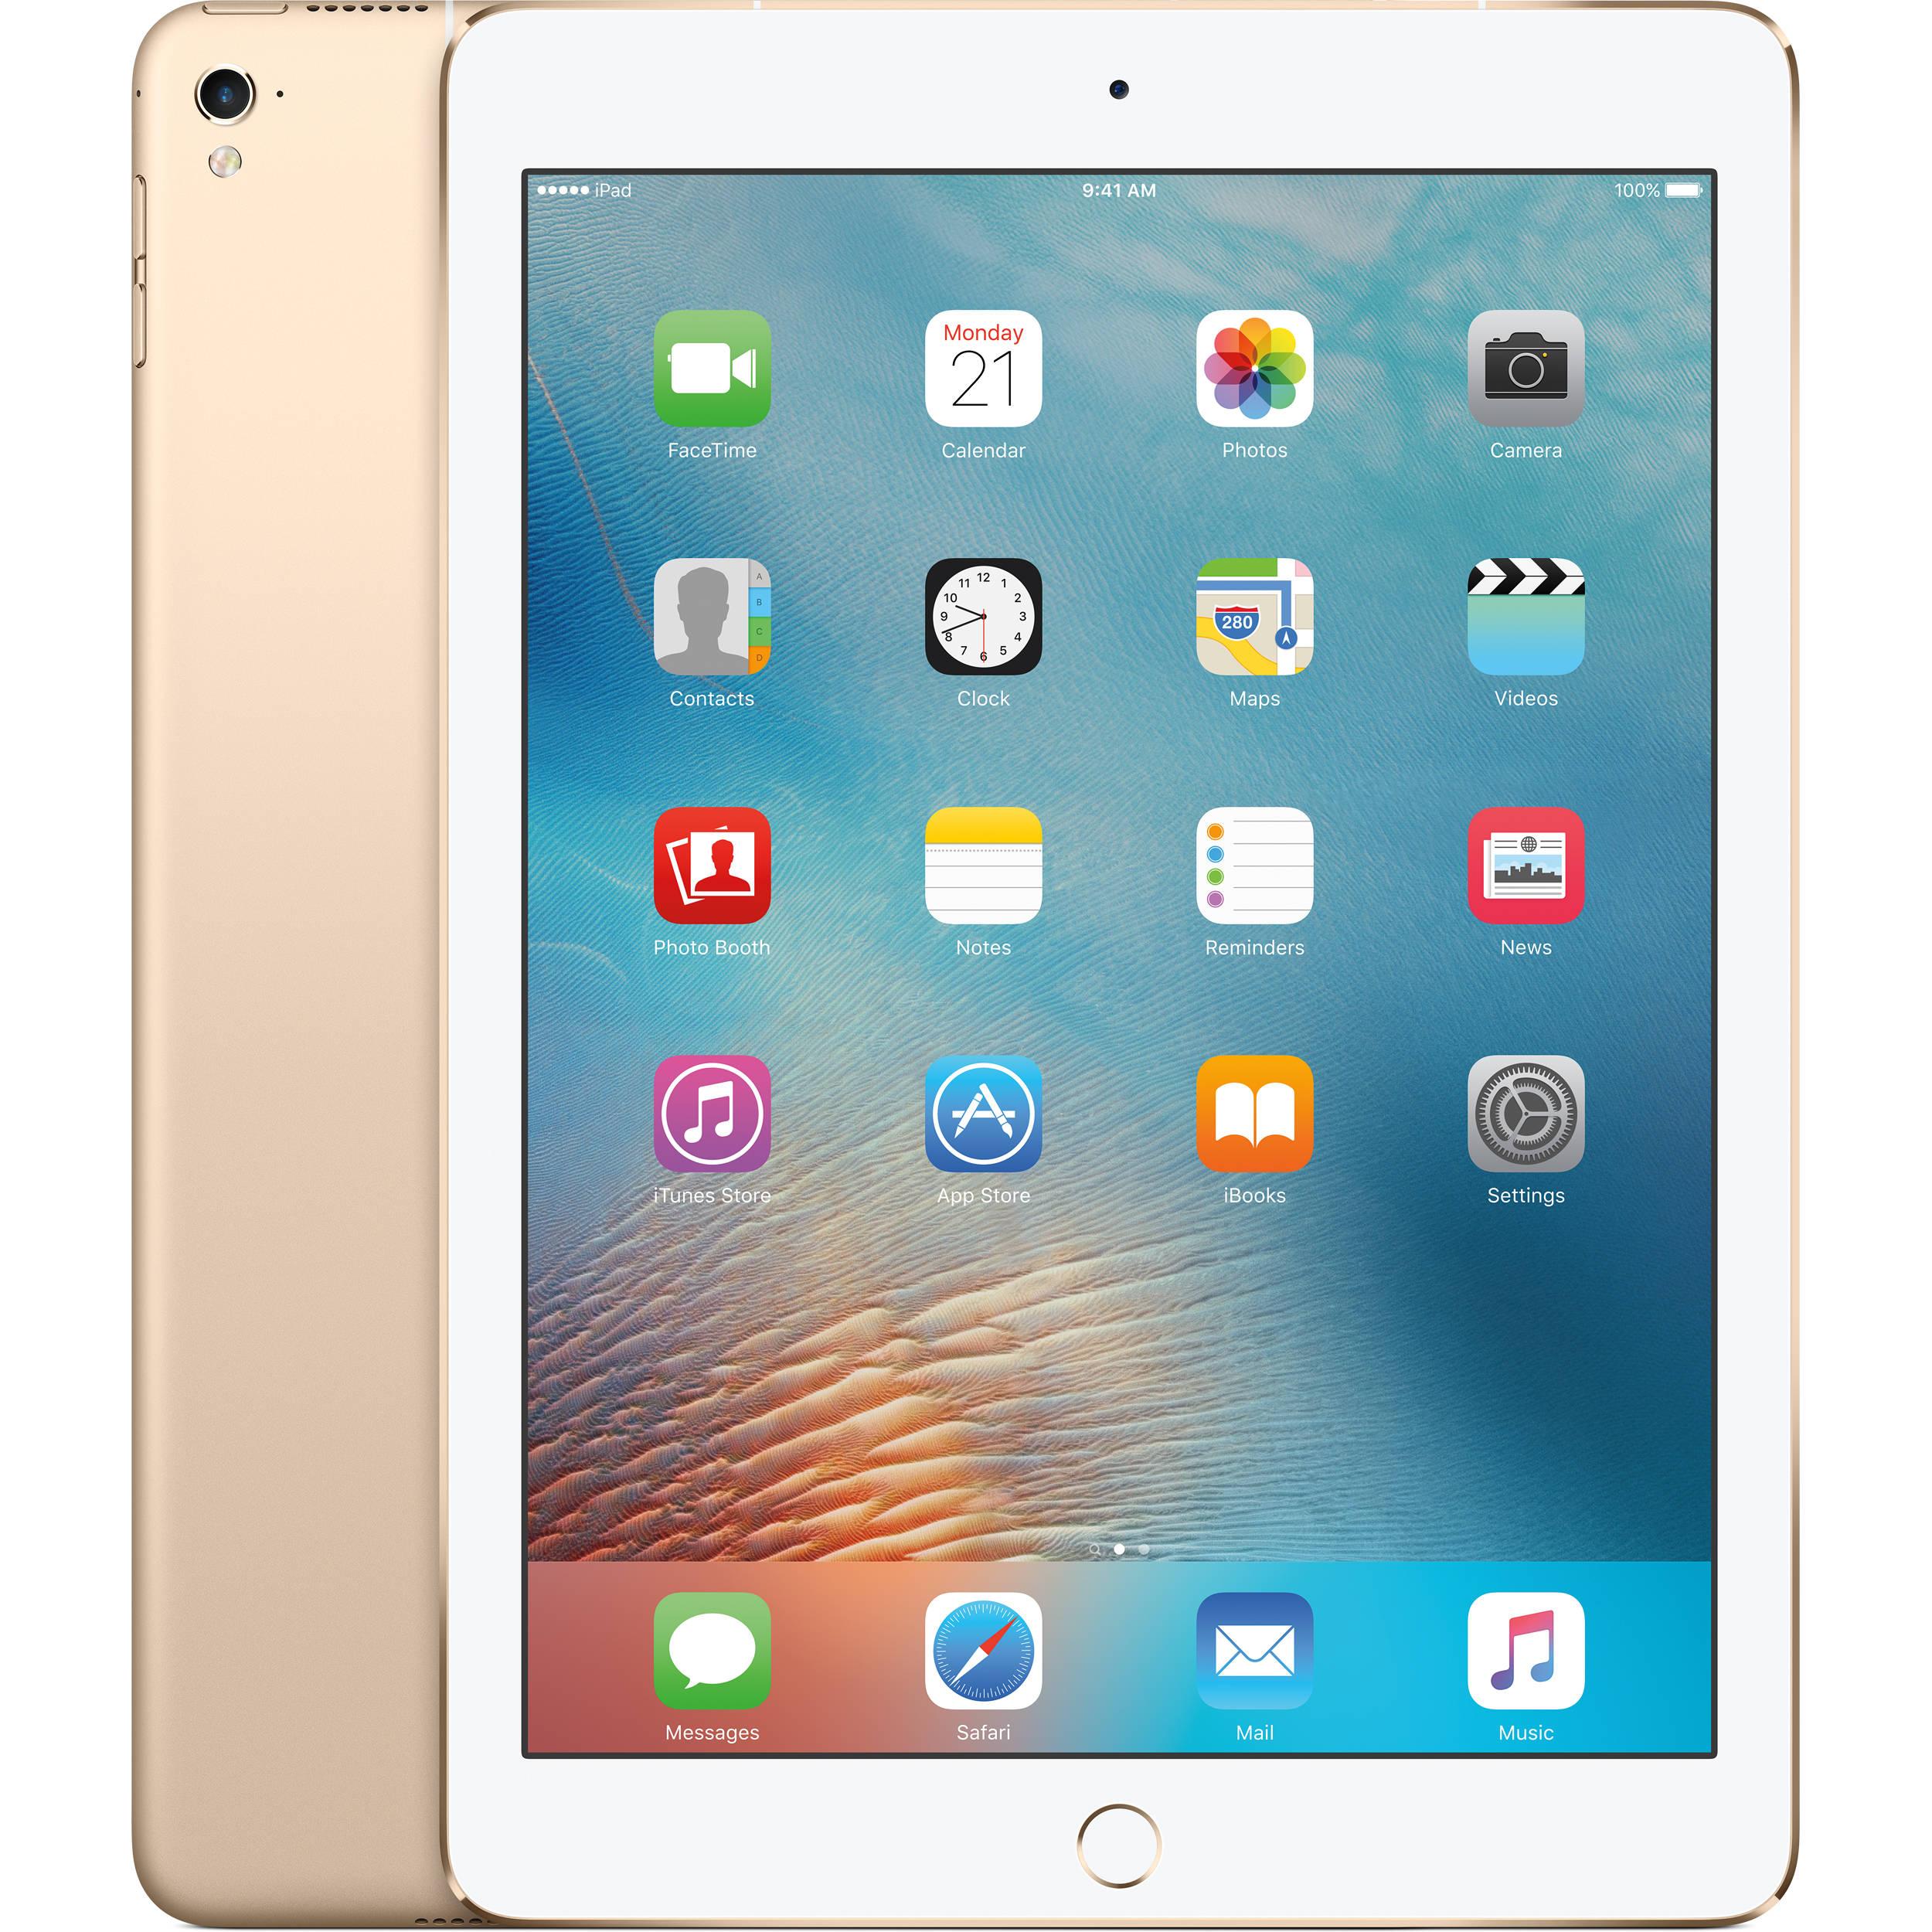 تبلت اپل مدل iPad Pro 9.7 inch WiFi ظرفيت 32 گيگابايت